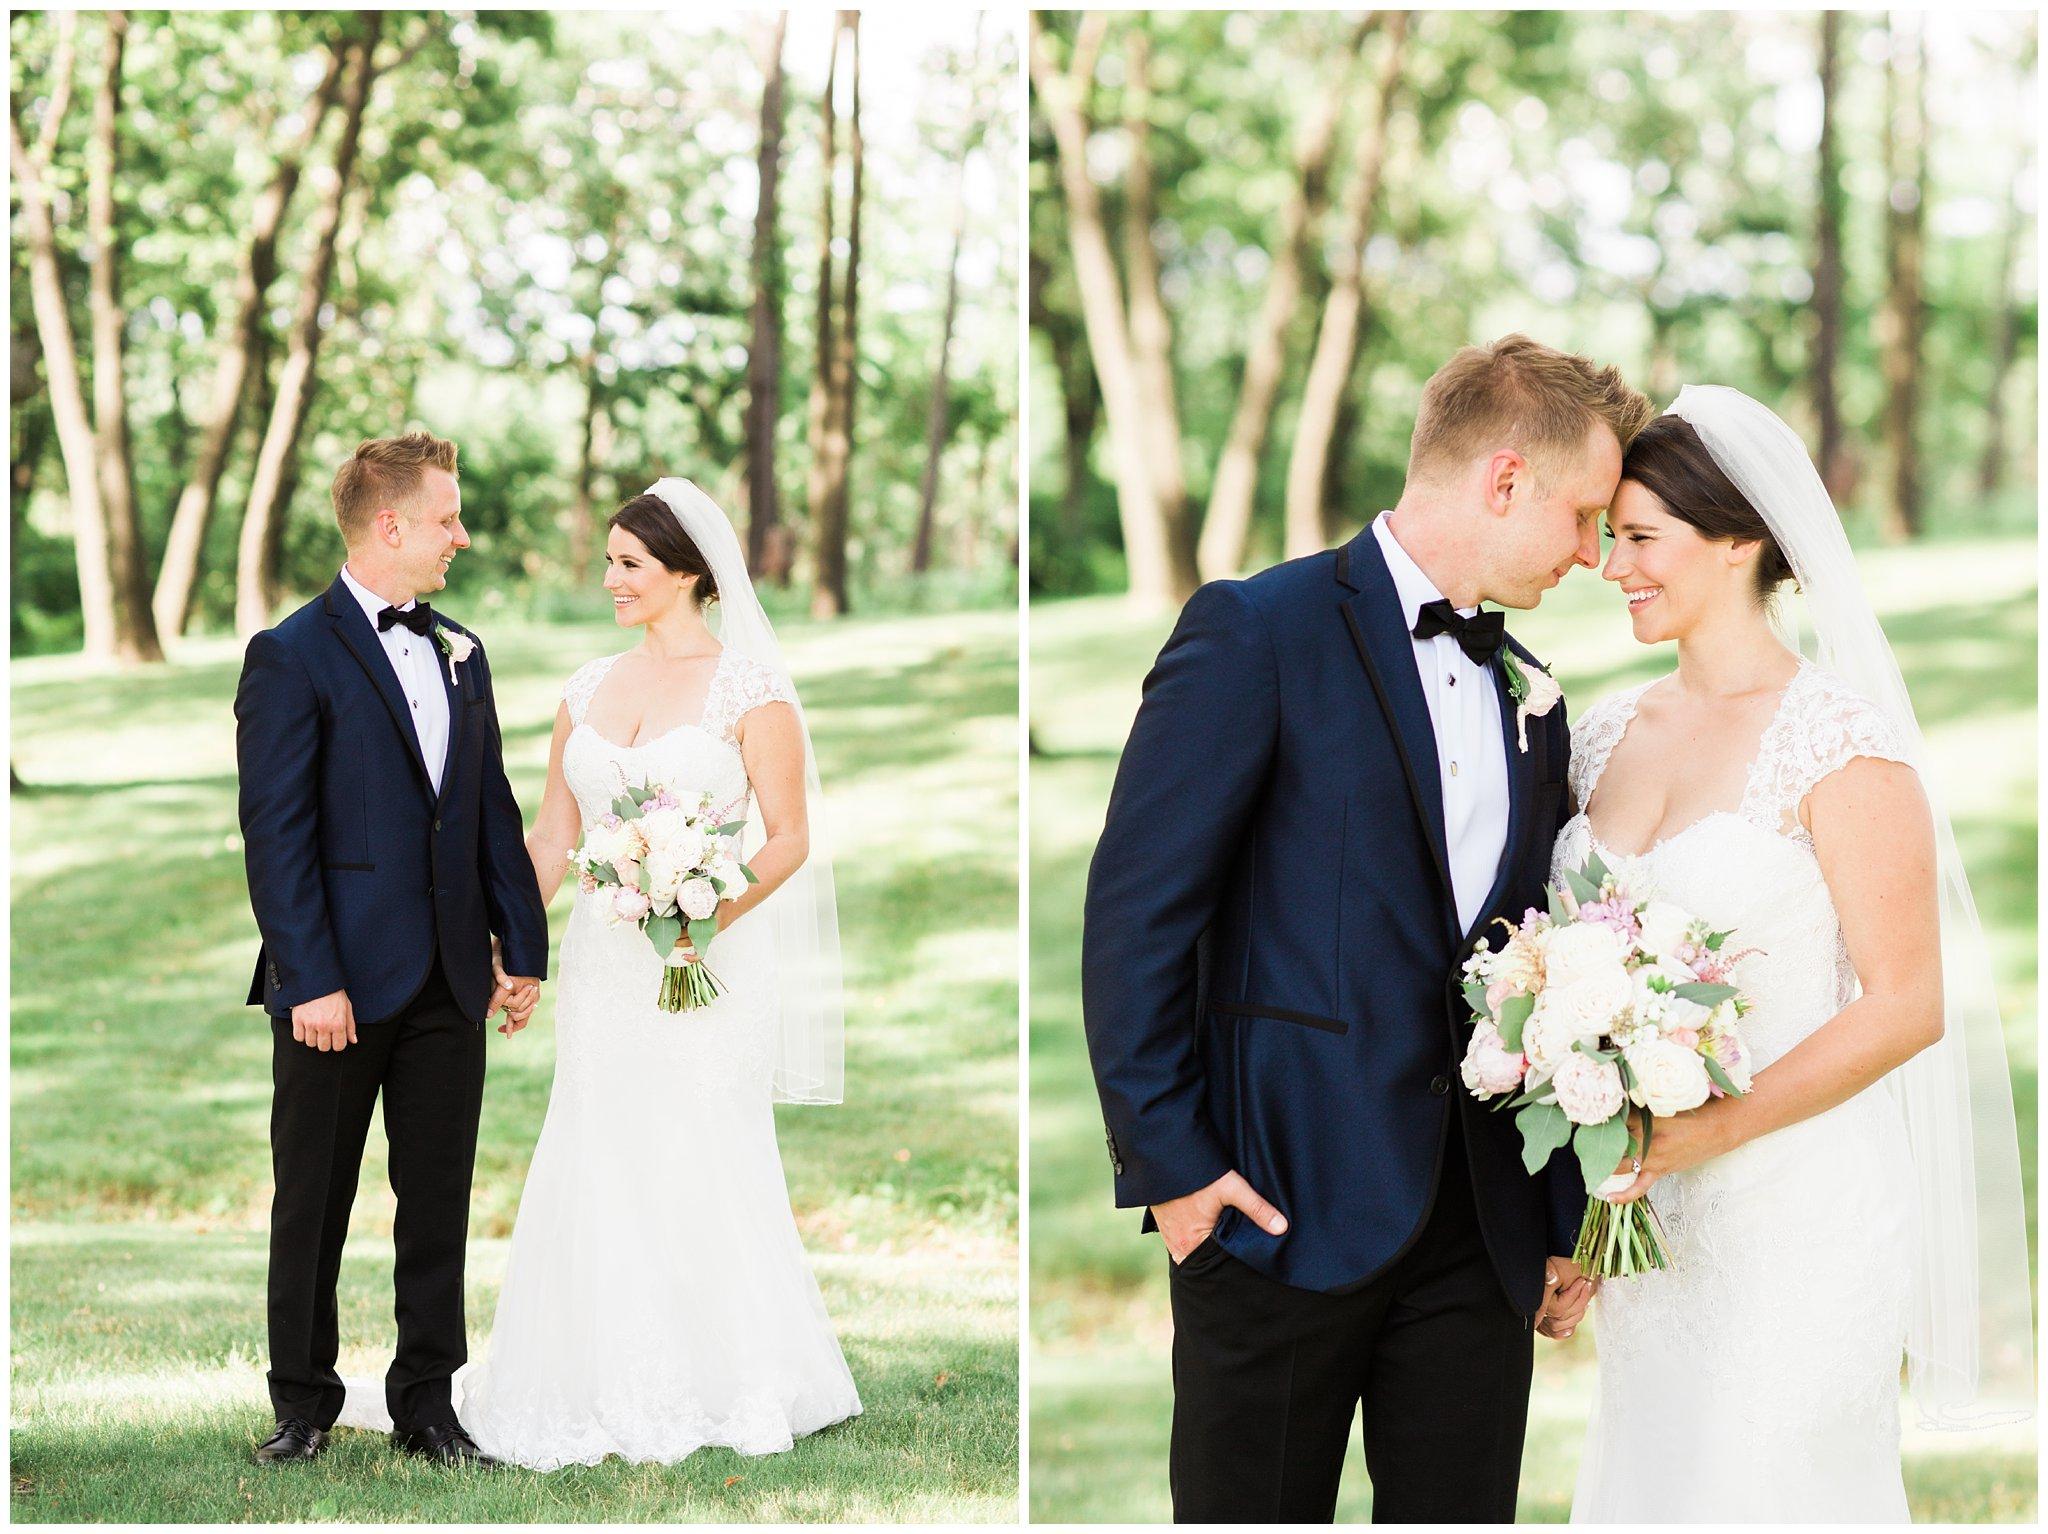 Alicia&Kurt_RavisloeCountryClubWedding_Chicagoweddingphotographer_RebeccaHaleyPhotography_0157.jpg